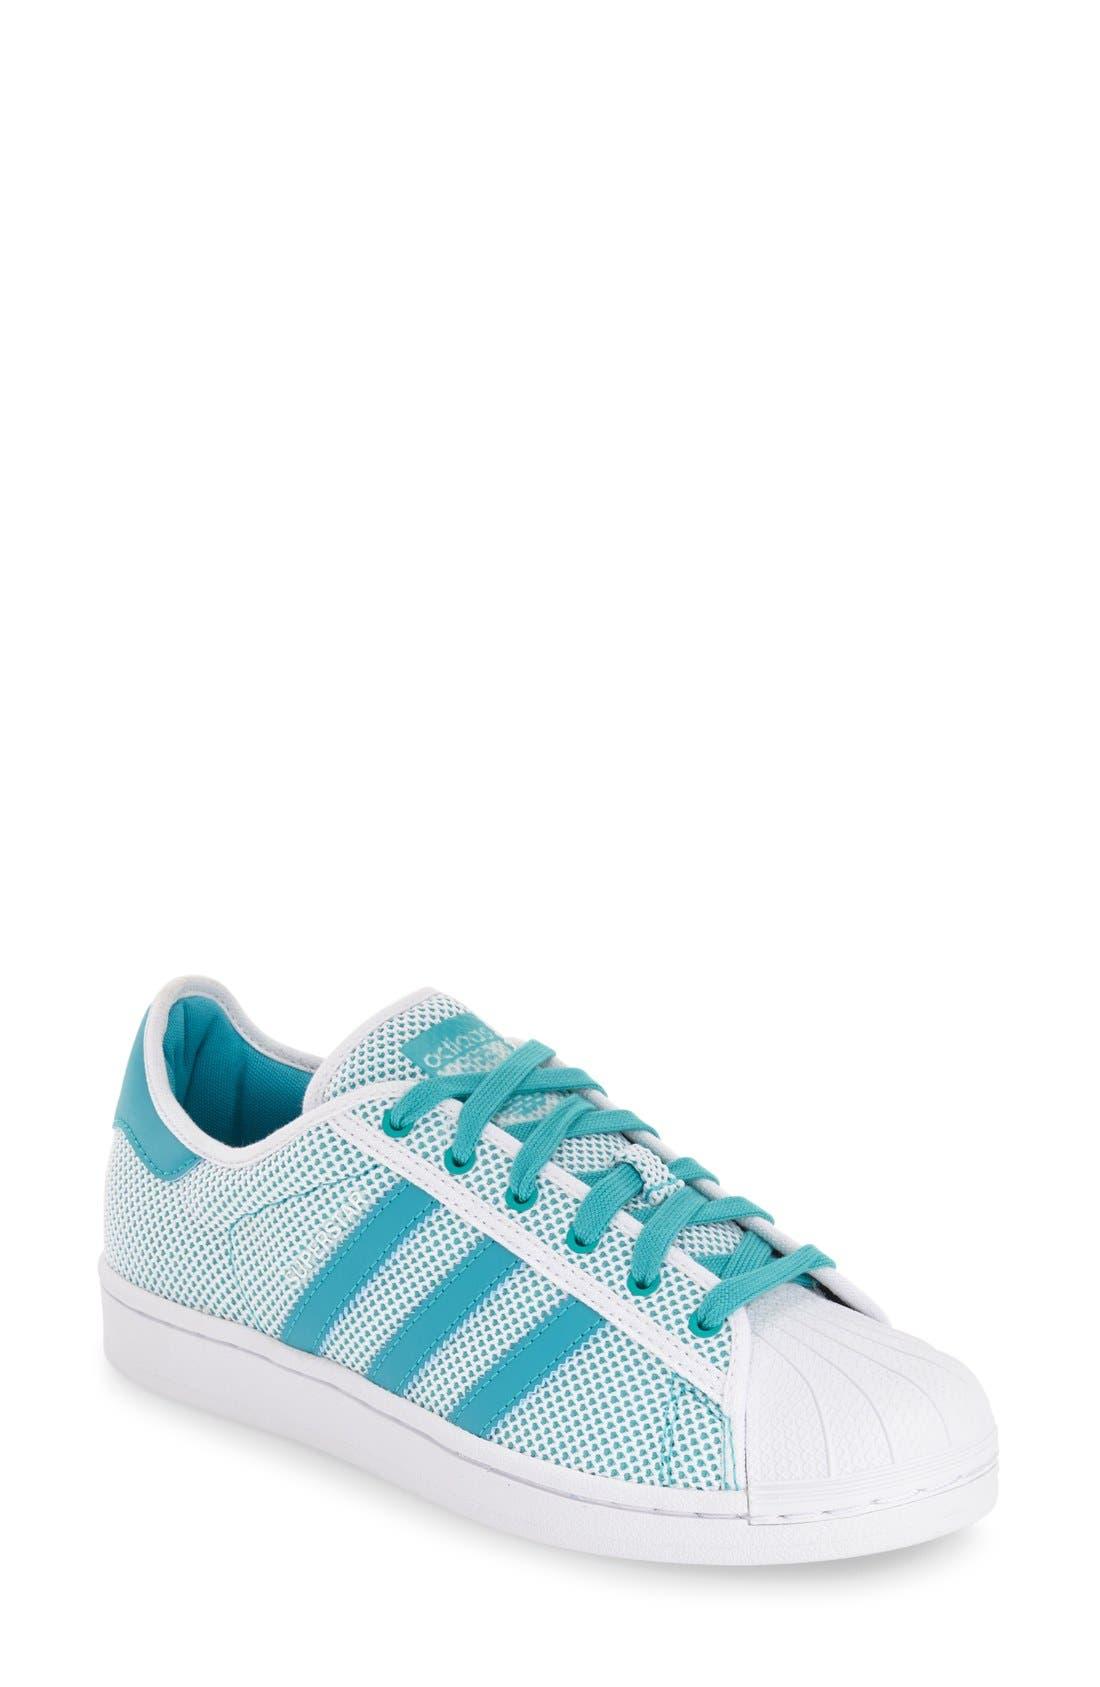 Alternate Image 1 Selected - adidas 'Superstar ADICOLOR' Sneaker (Women)